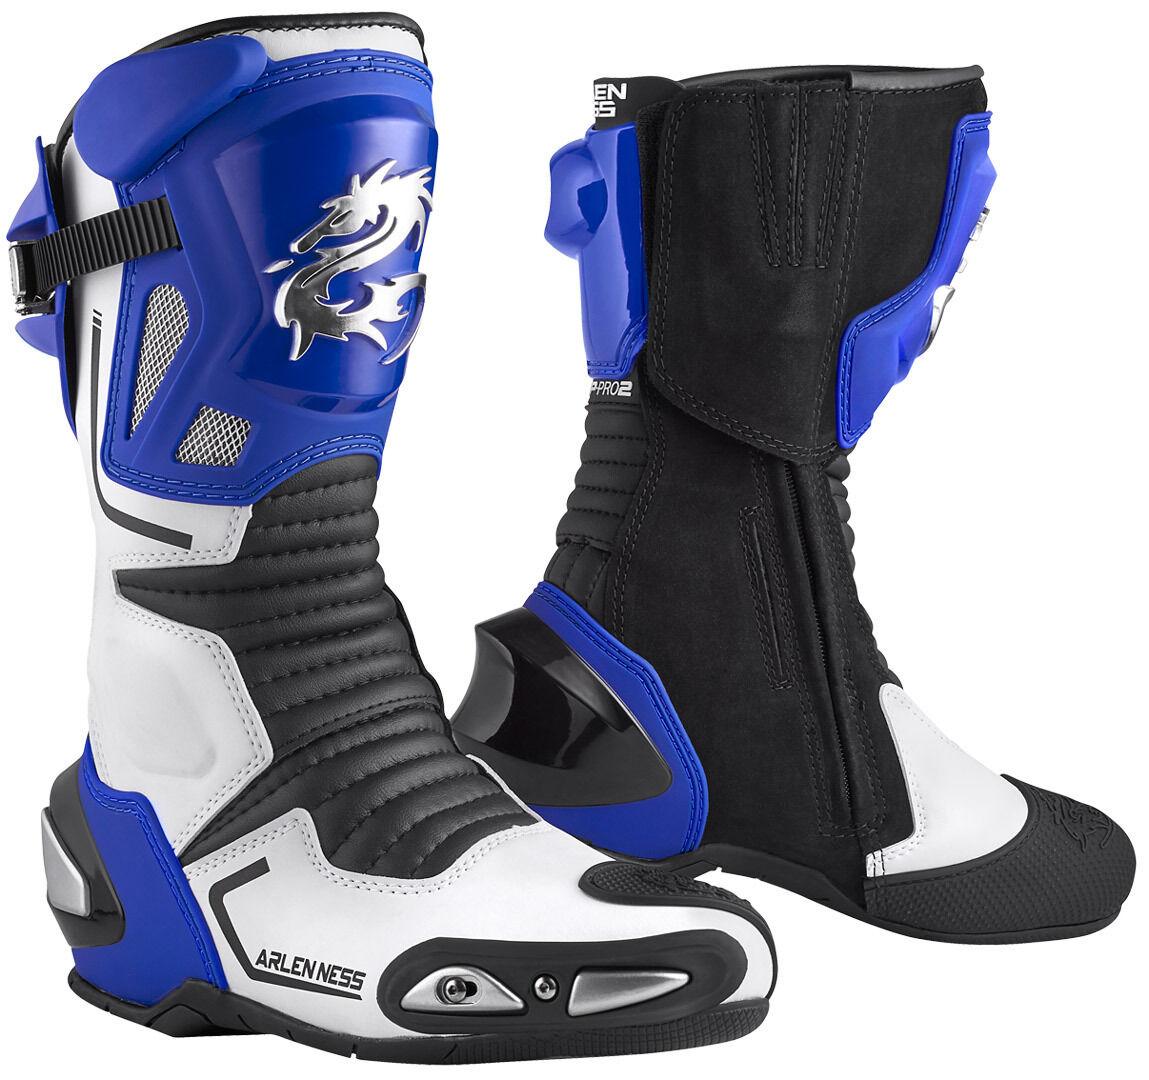 Arlen Ness Sugello Bottes de moto Noir Blanc Bleu taille : 46